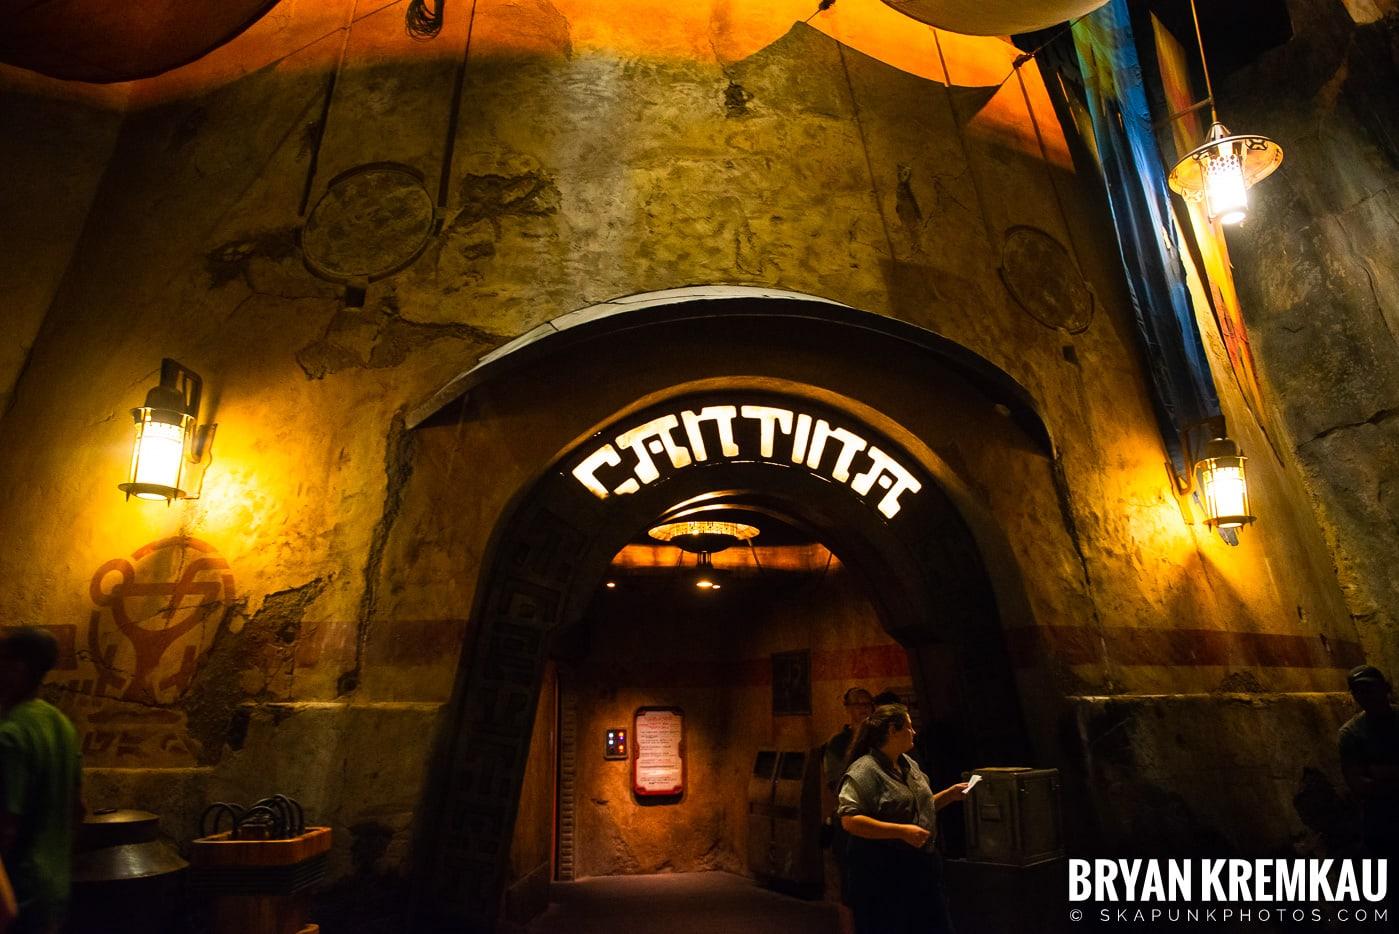 Walt Disney World Vacation: Day 5 (Animal Kingdom / Disney's Hollywood Studios) - 10.3.19 (12)